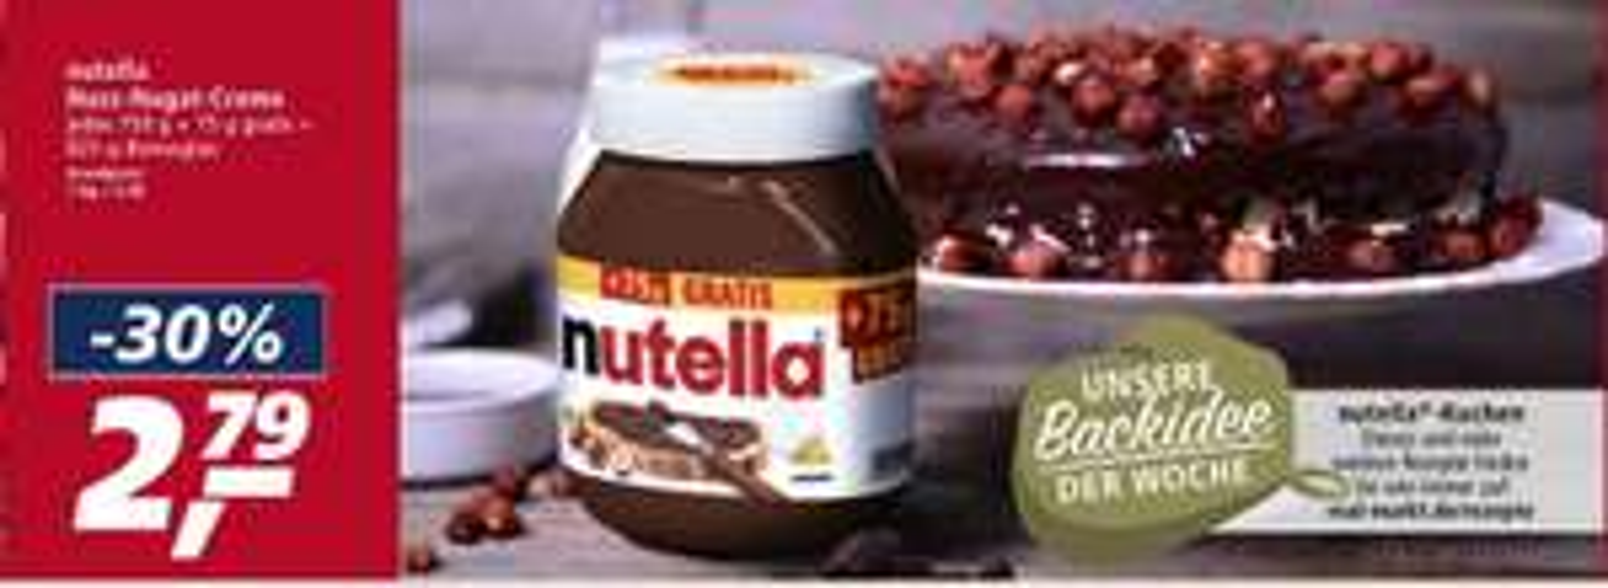 Nutella 750g + 75g Gratis Bonusglas (Real)